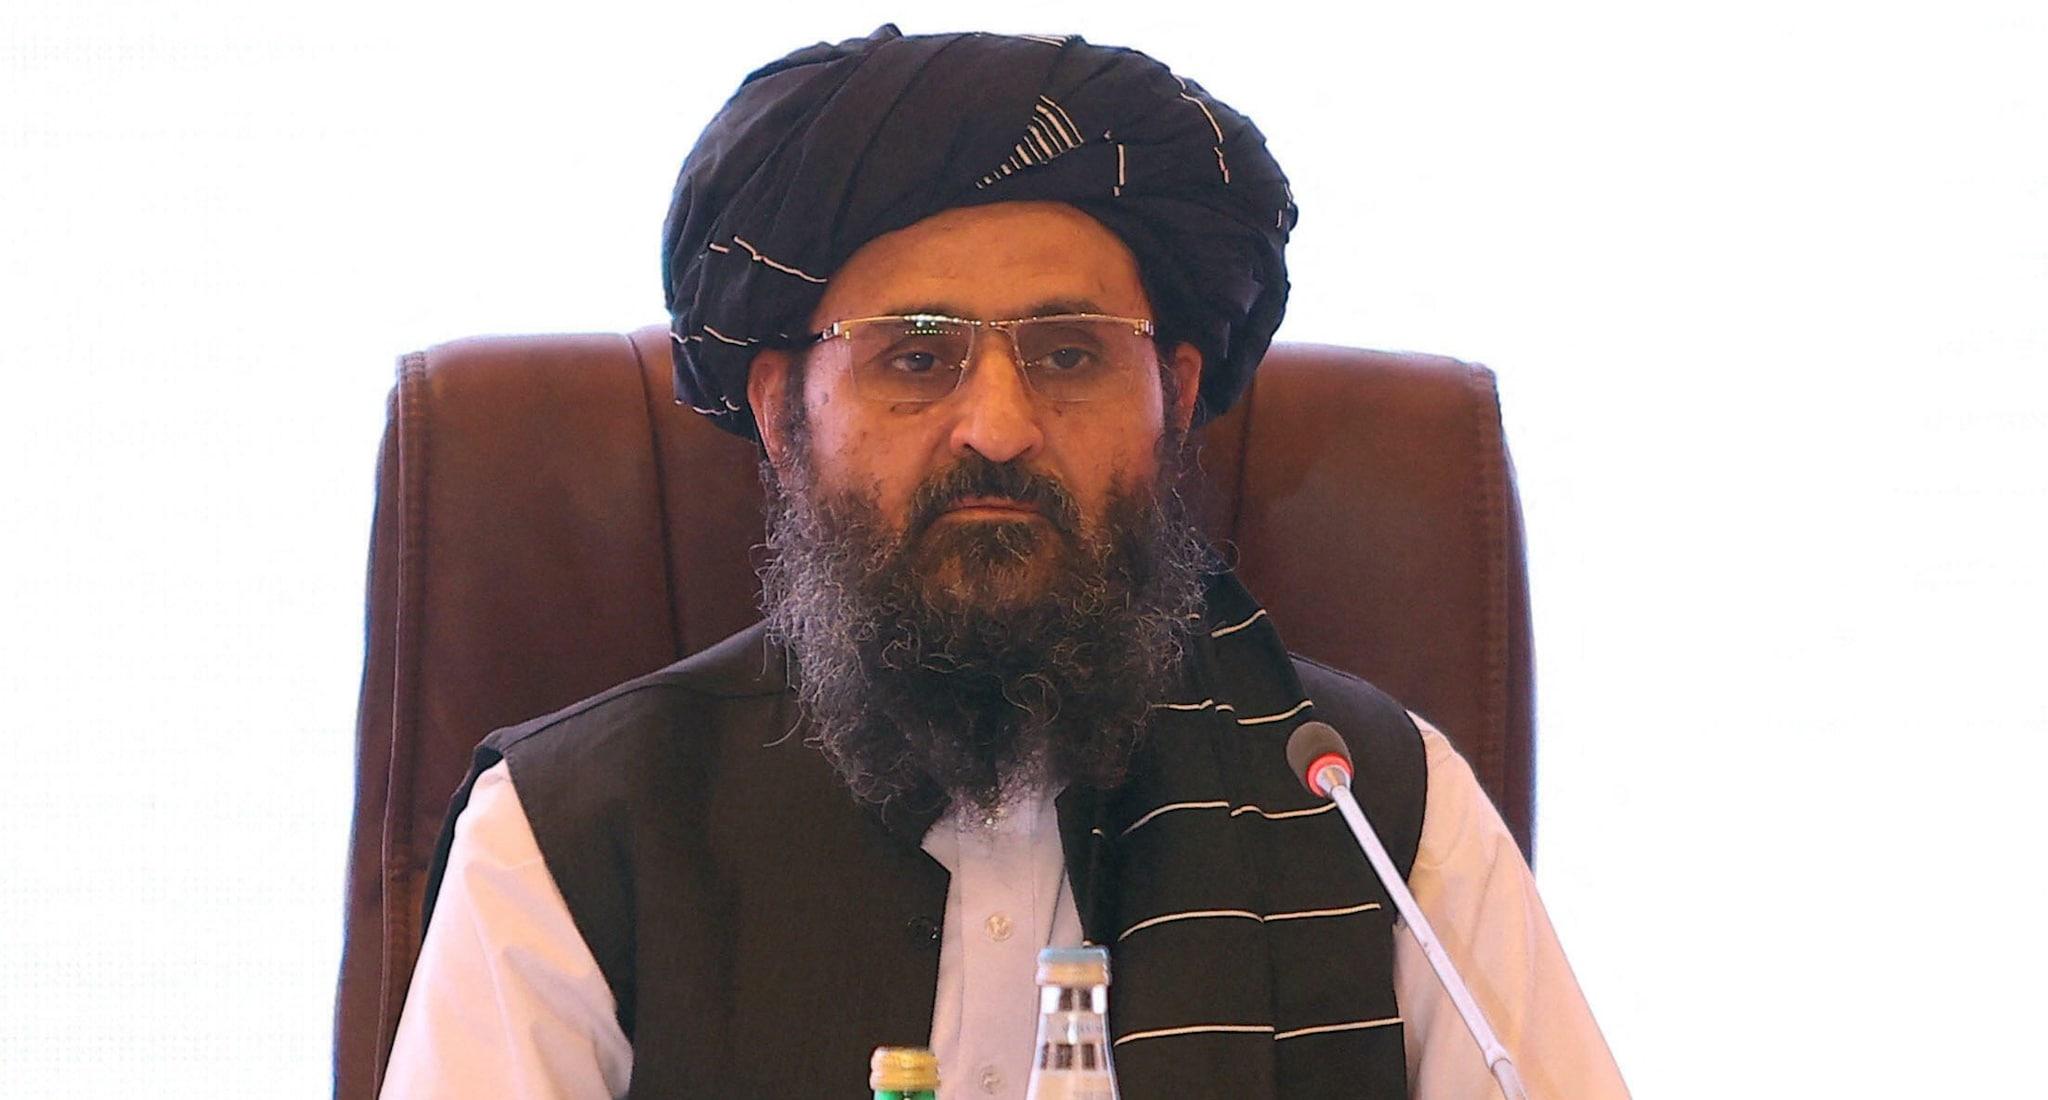 Mullah Abdul Ghani Bardar